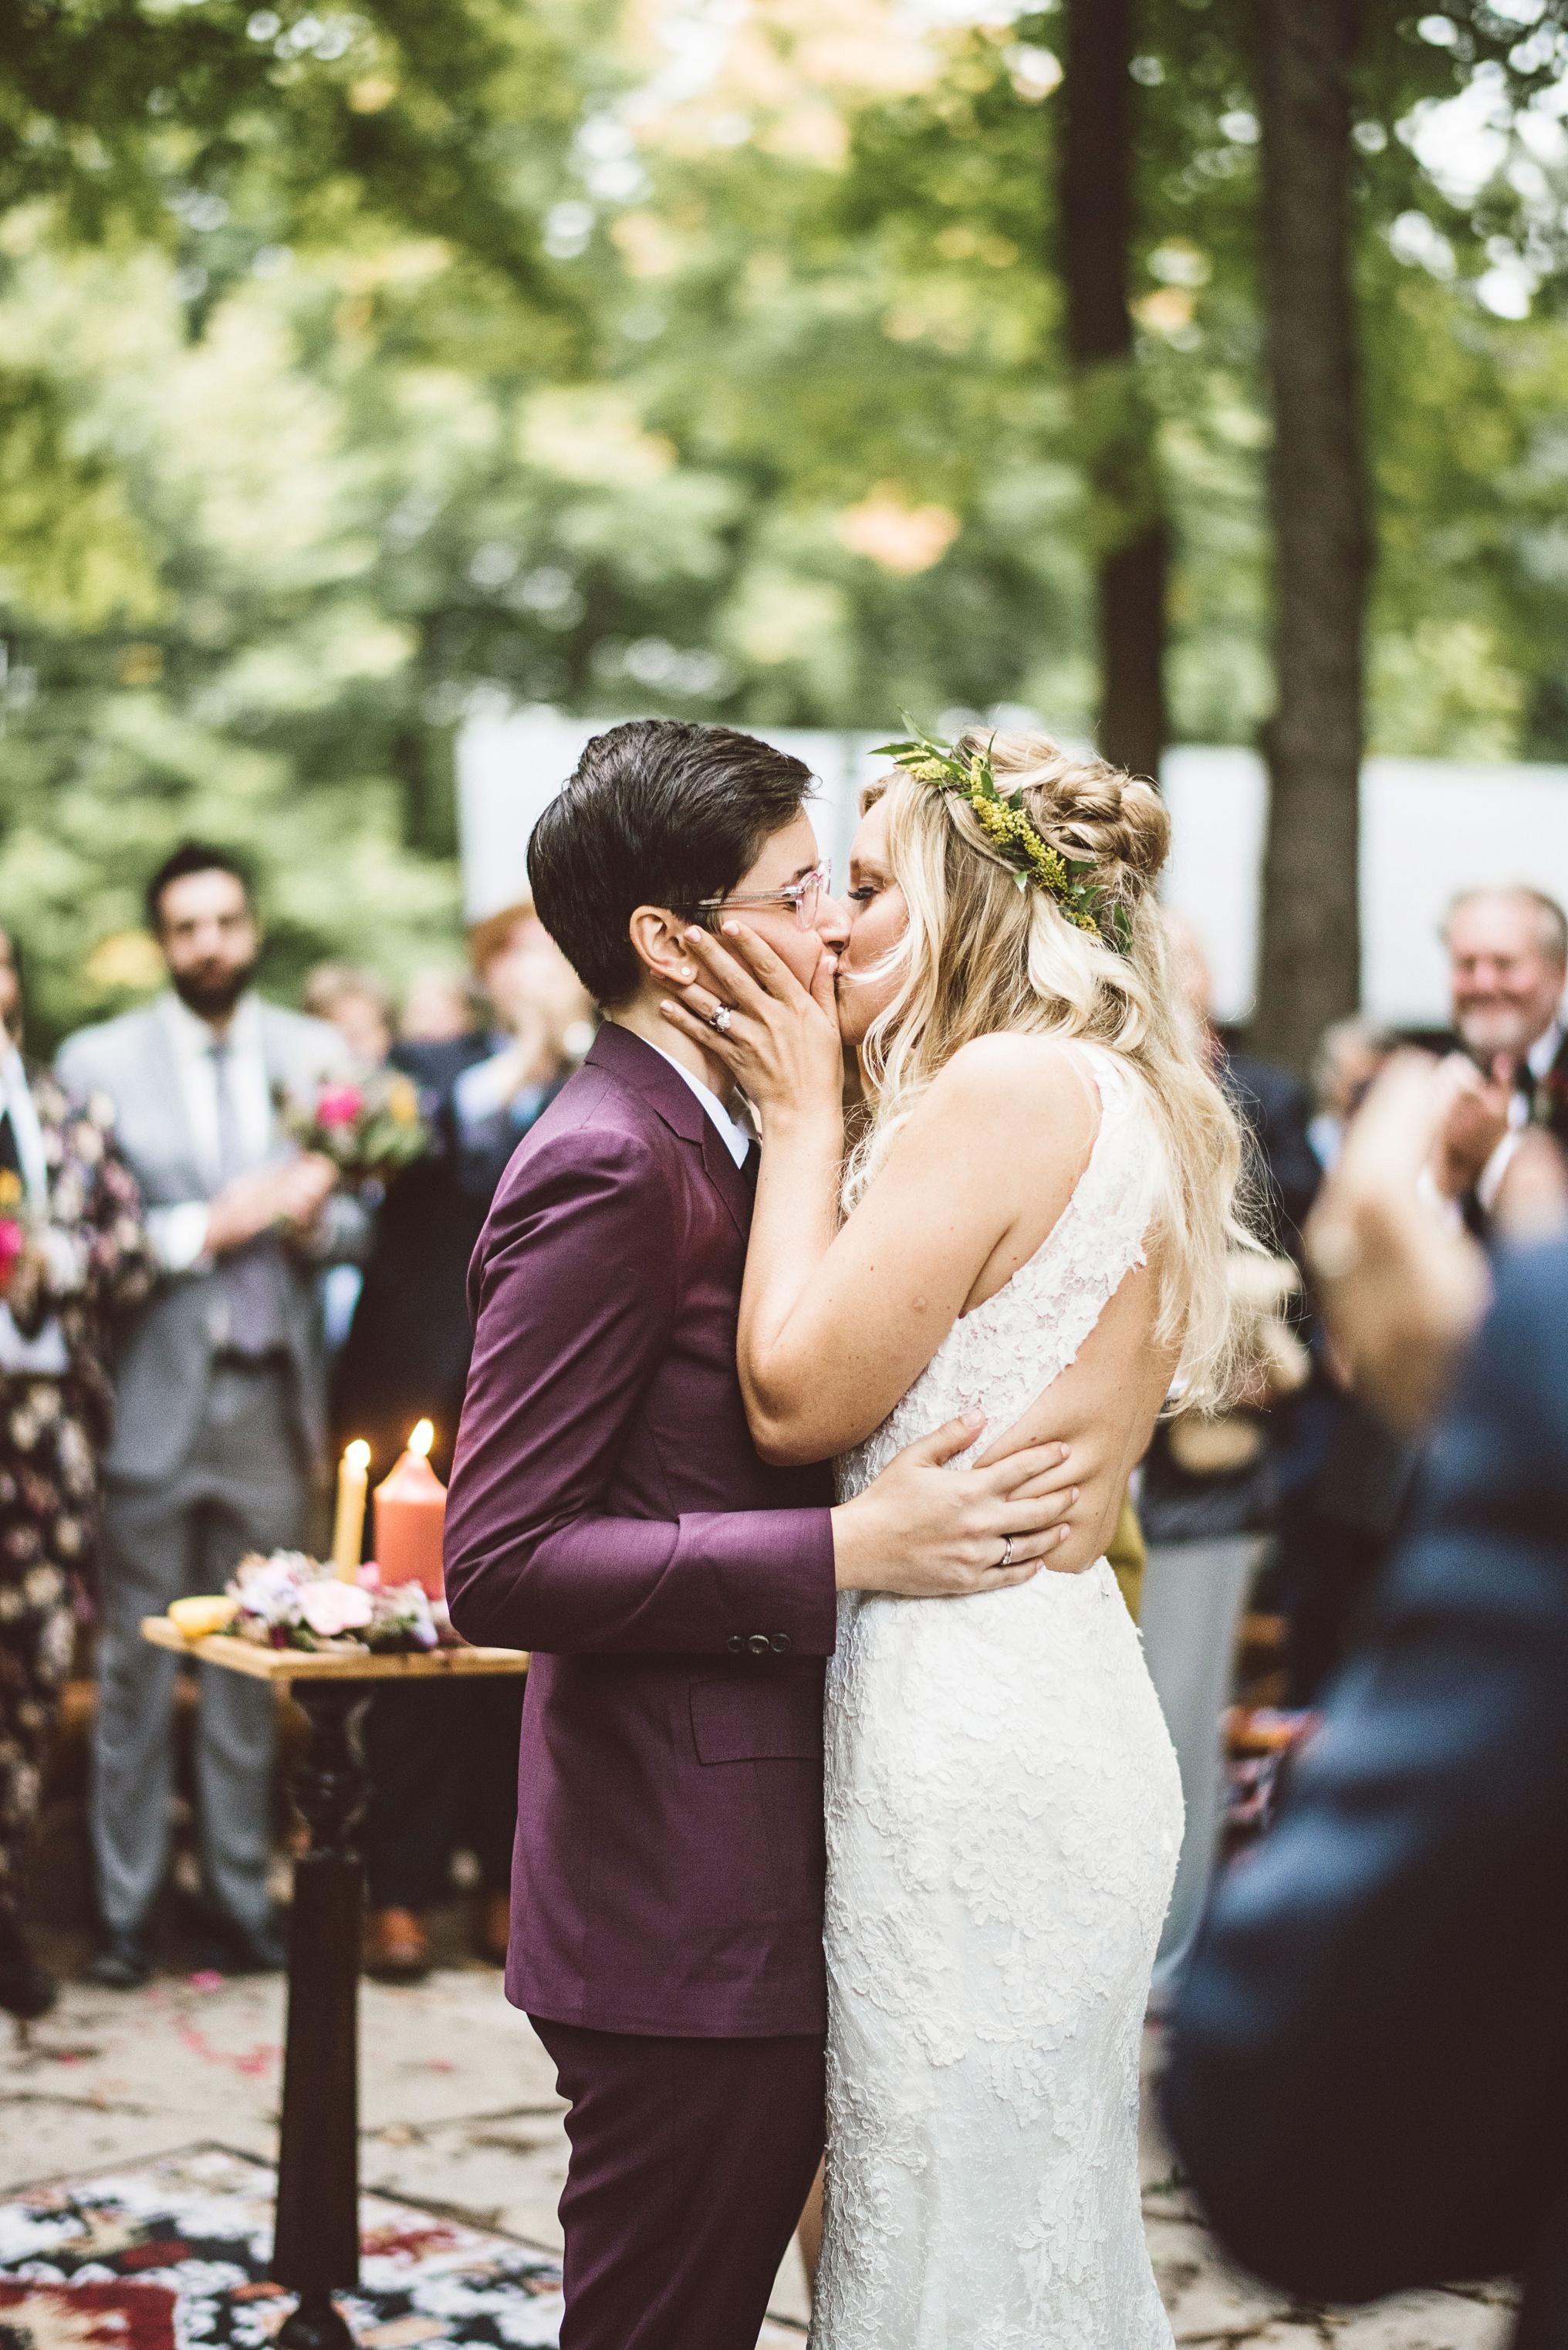 best_wedding_photography_2017_by_lucas_botz_photography_050.jpg